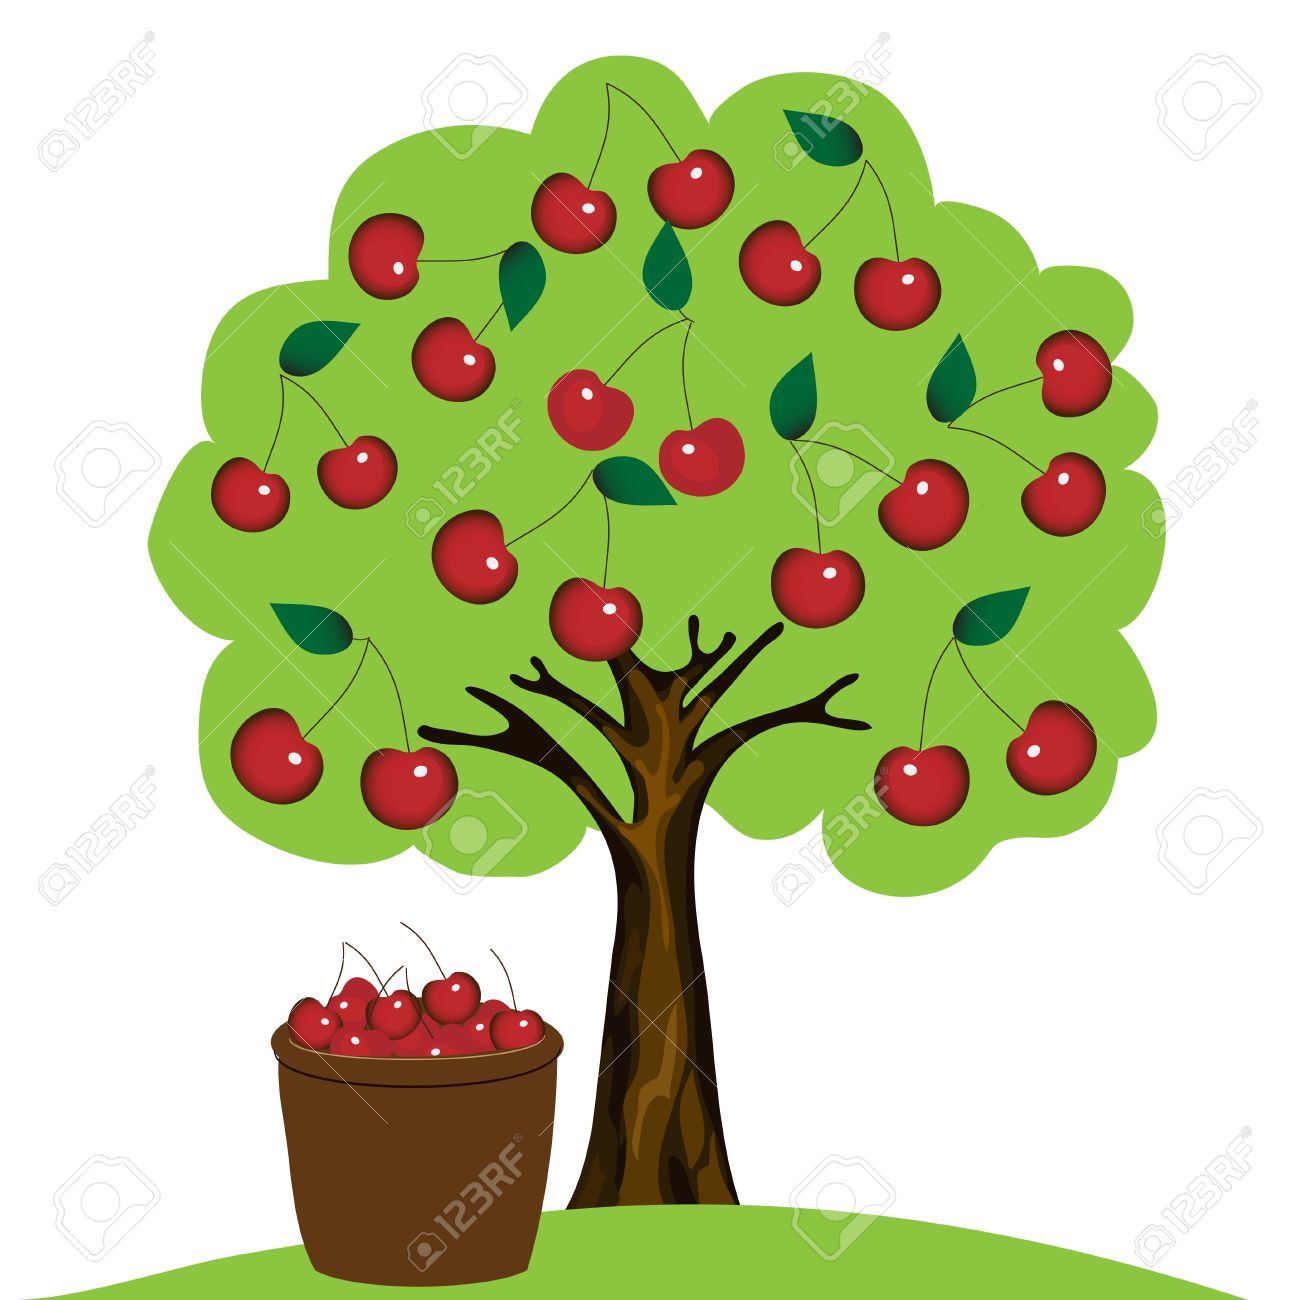 Cherry Tree Clip Art-Cherry Tree Clip Art-3